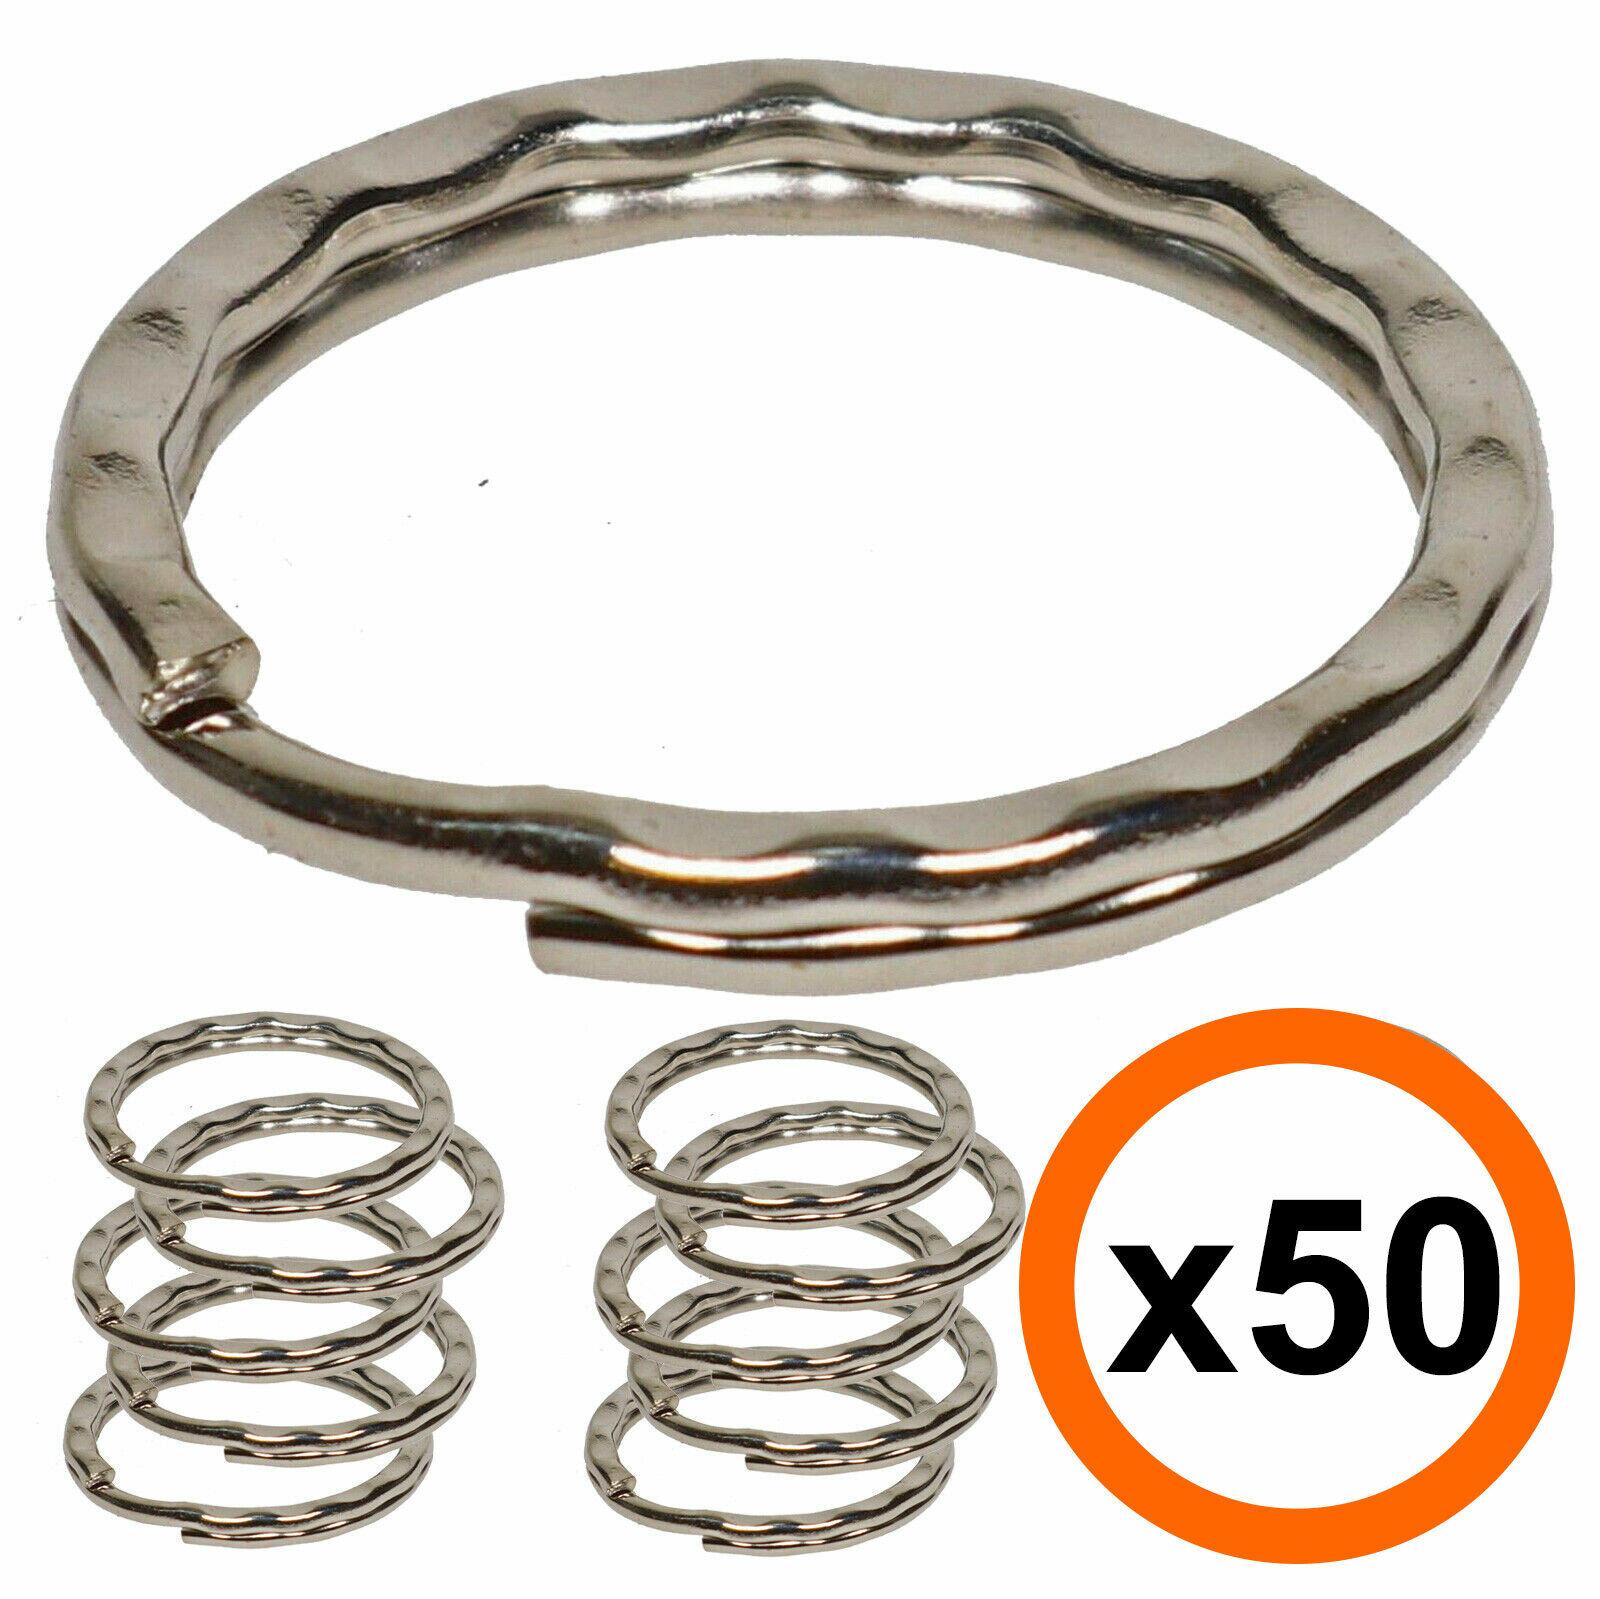 Key Chain Ring Silver Split Ring Key Chain Accessories Key Ring Nickel Plated Silver Split Rings 24mm Split Ring 50 Pack